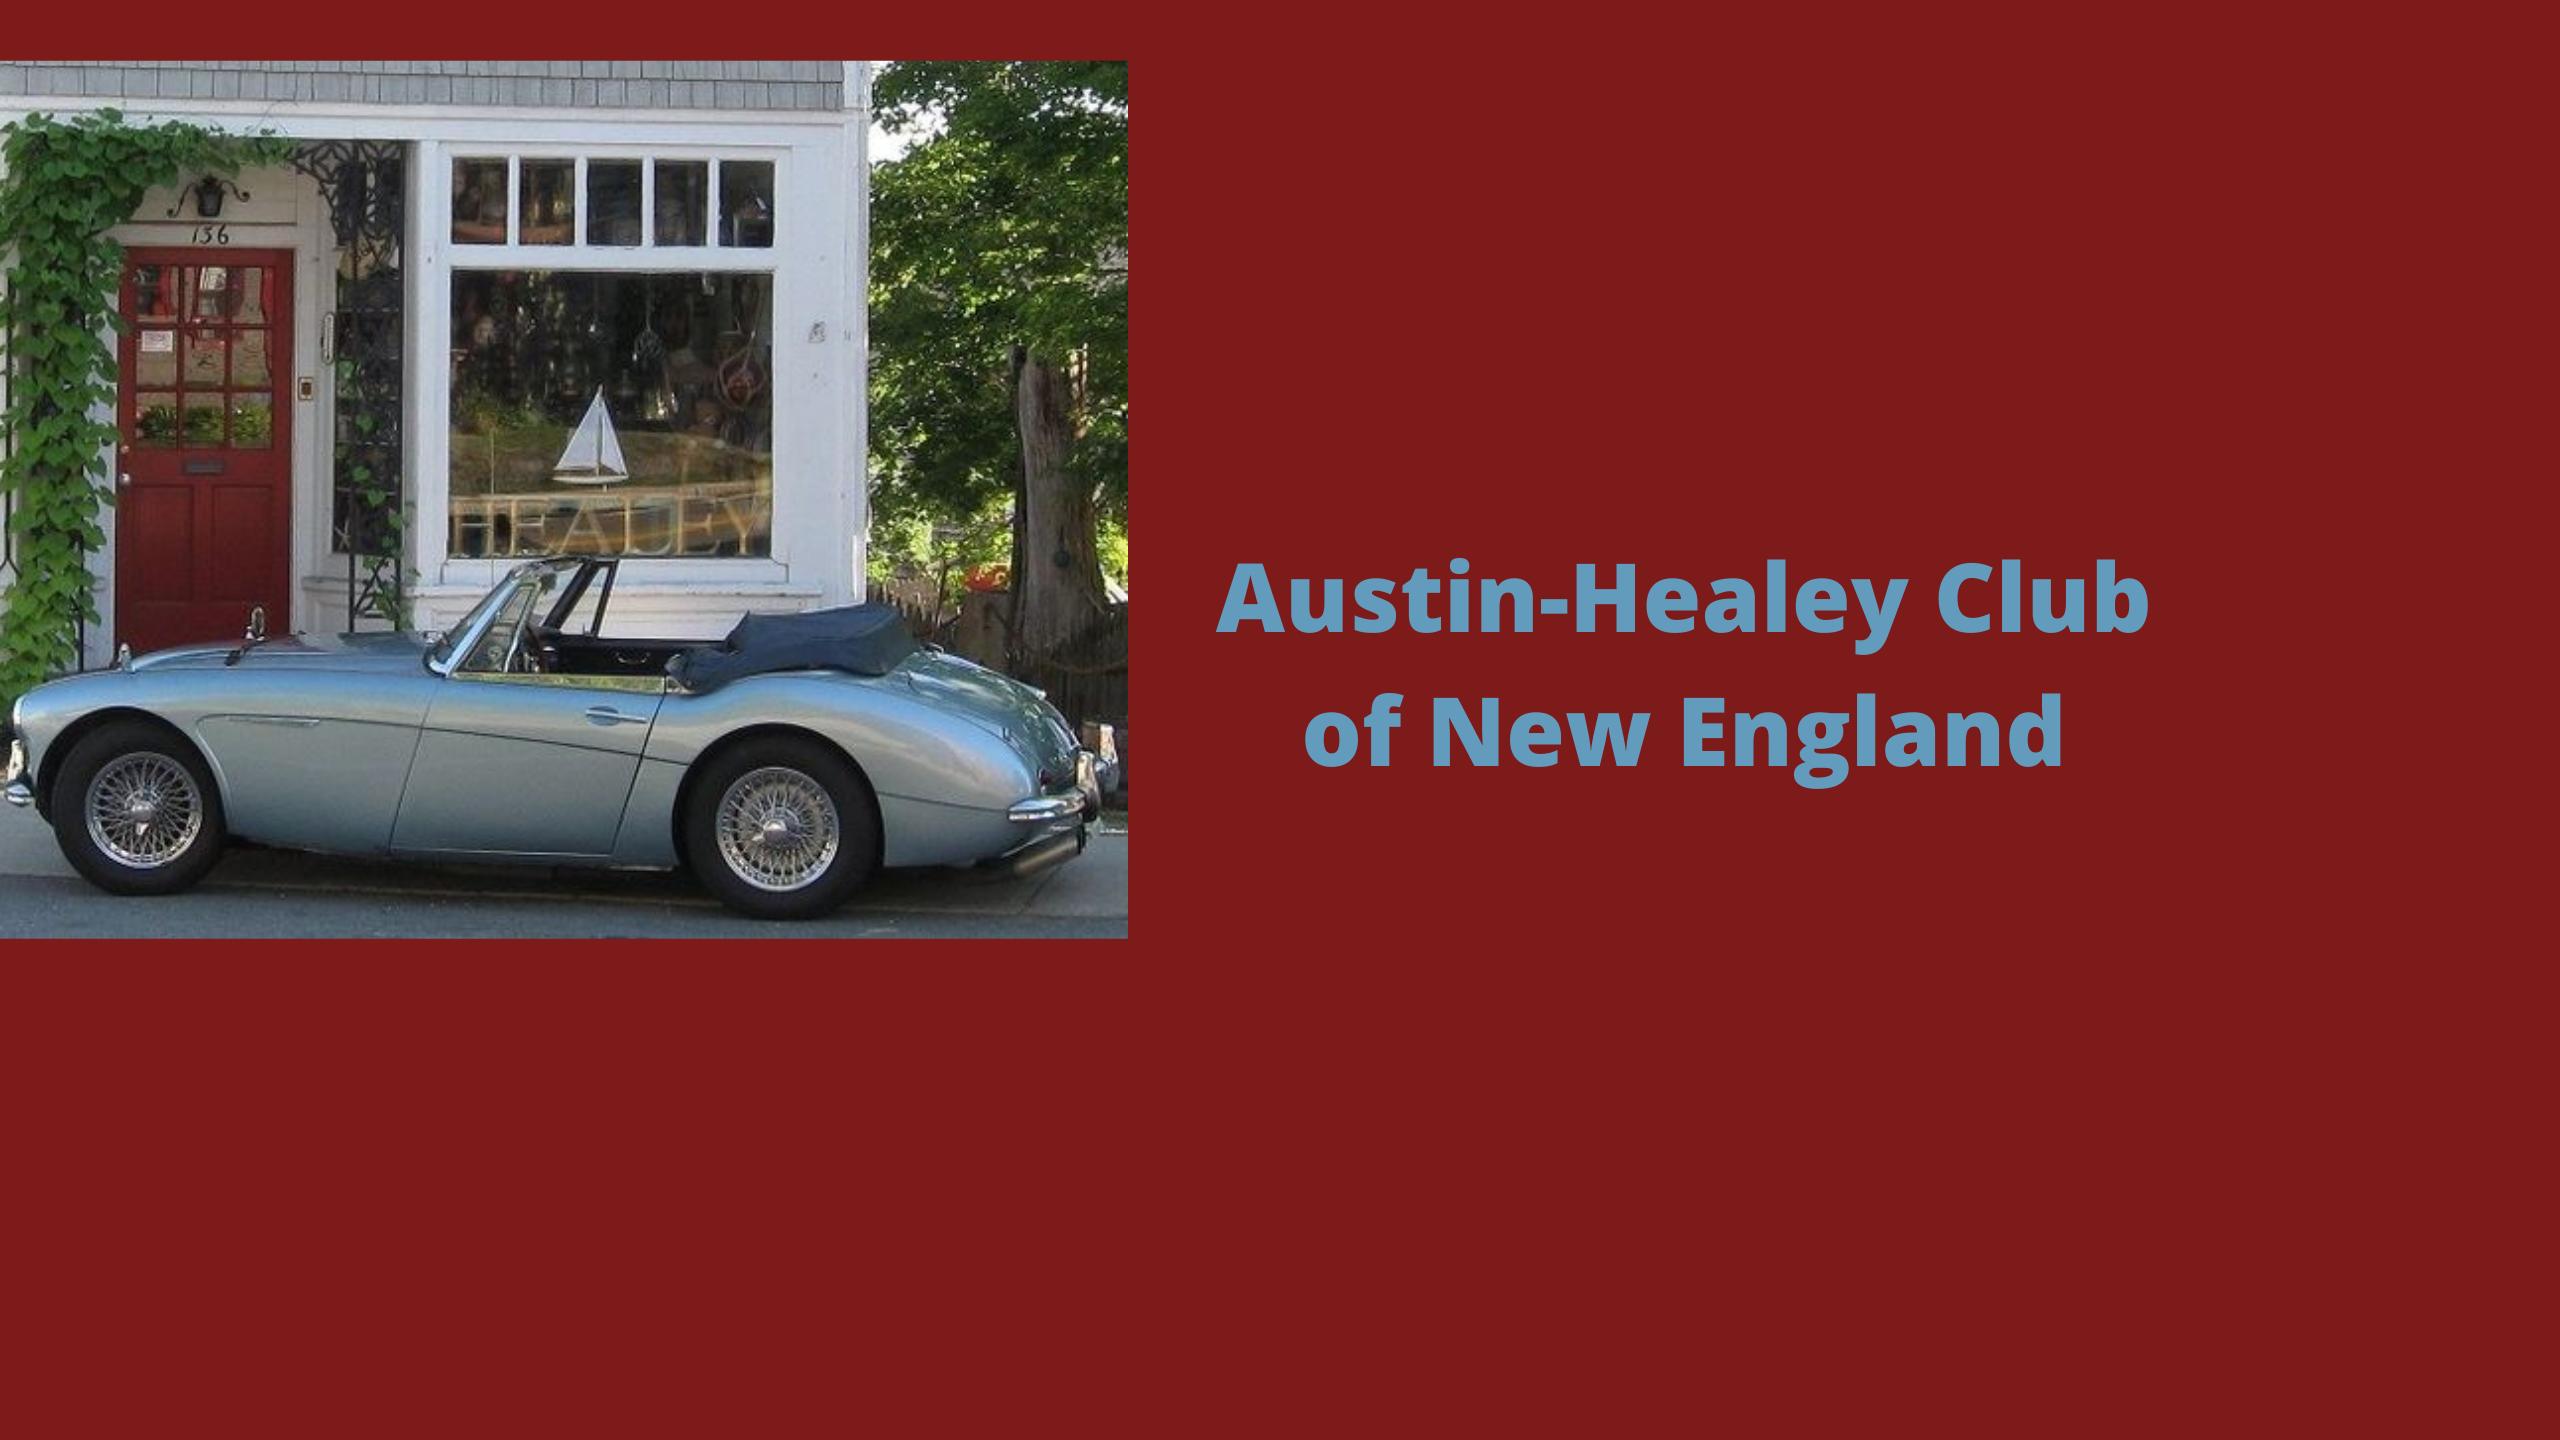 Austin-Healey Club of New Endland (4).png